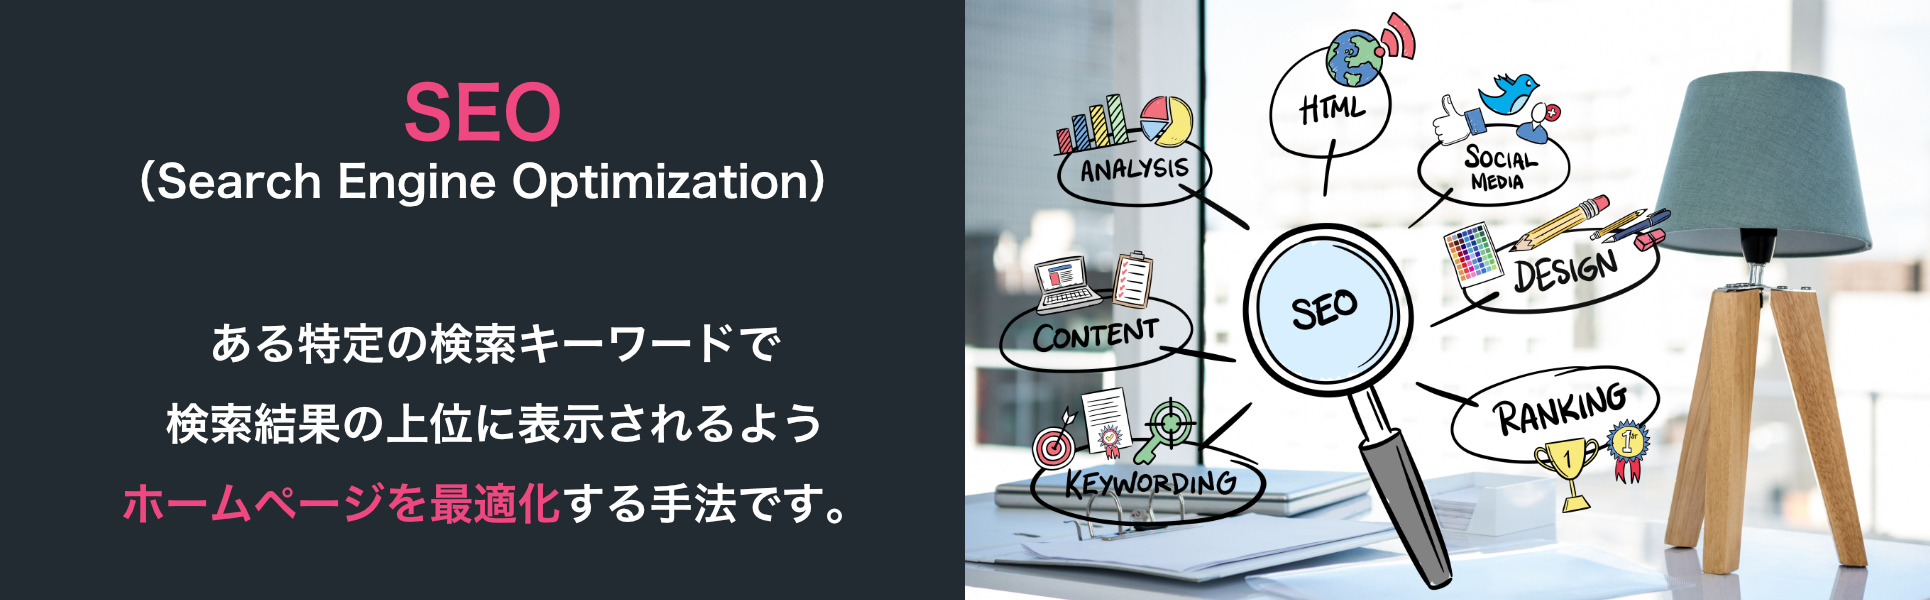 SEO(Search Engine Optimization)